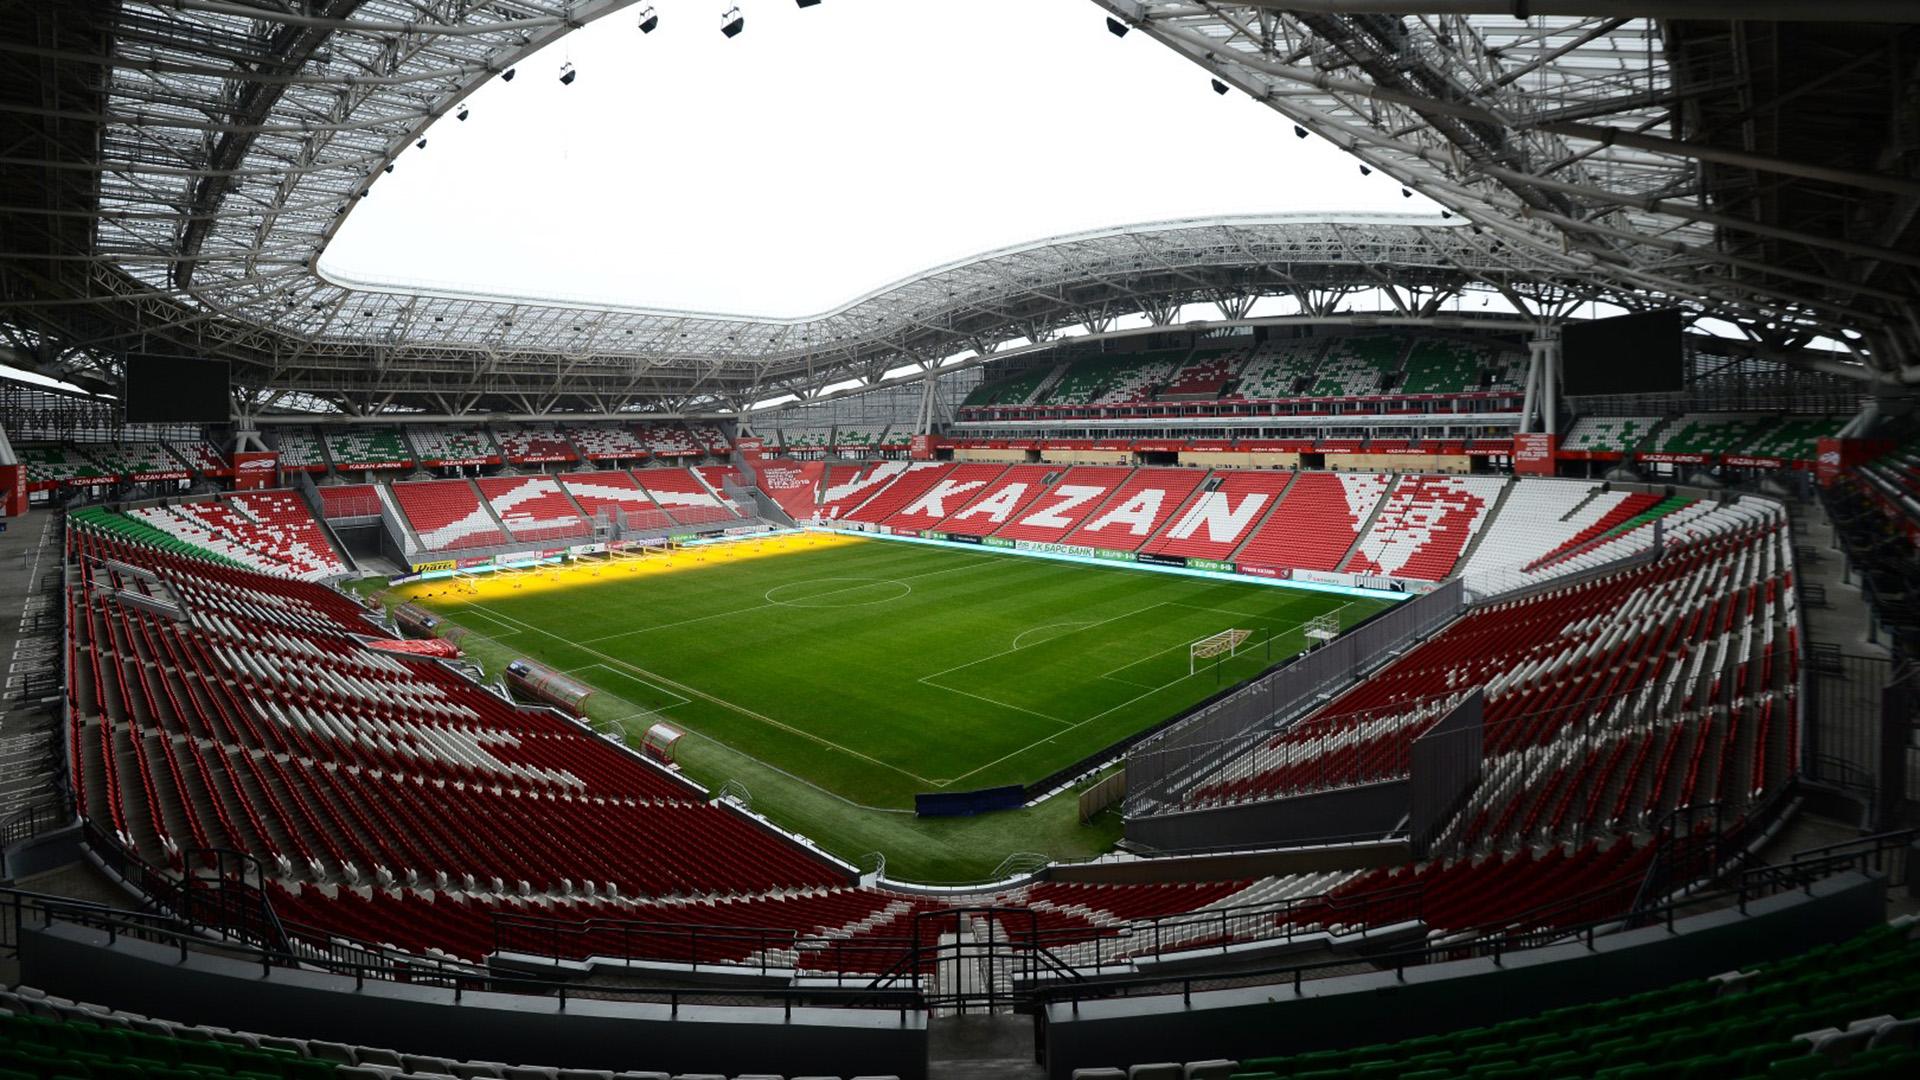 Kazan Arena 2018 World Cup Russia